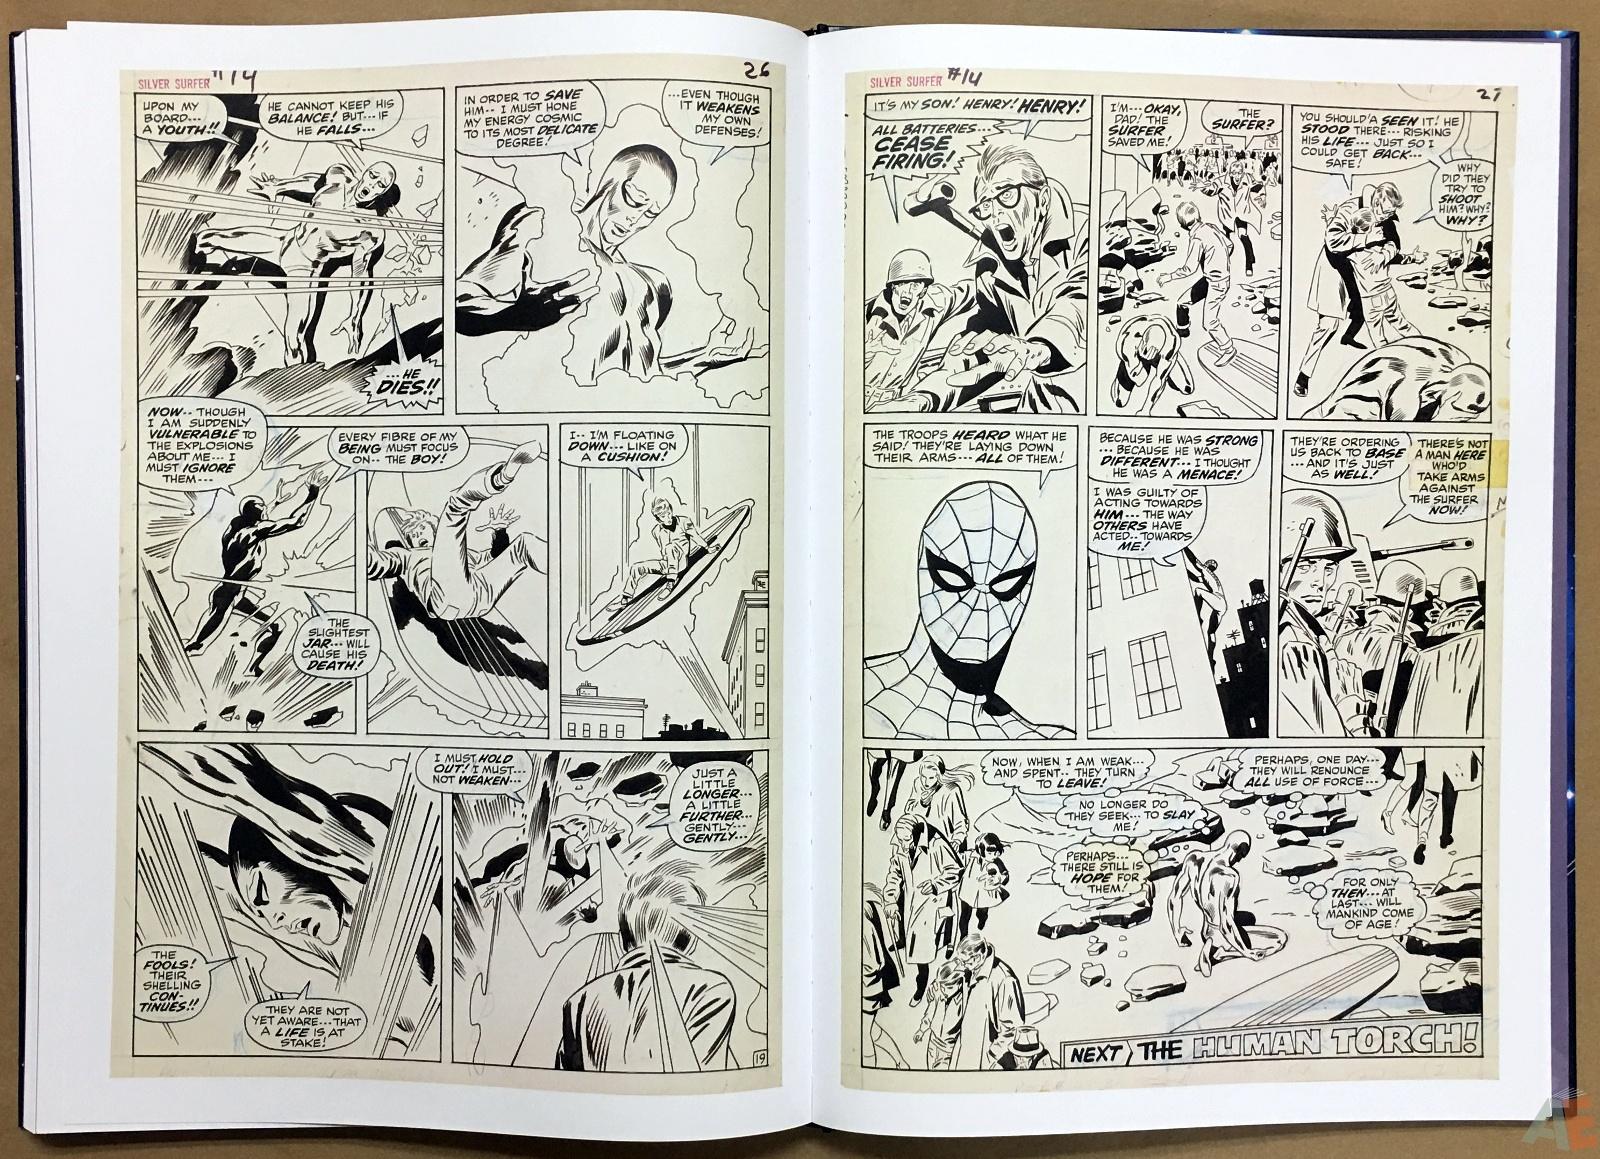 John Buscema's Silver Surfer Artist's Edition 38